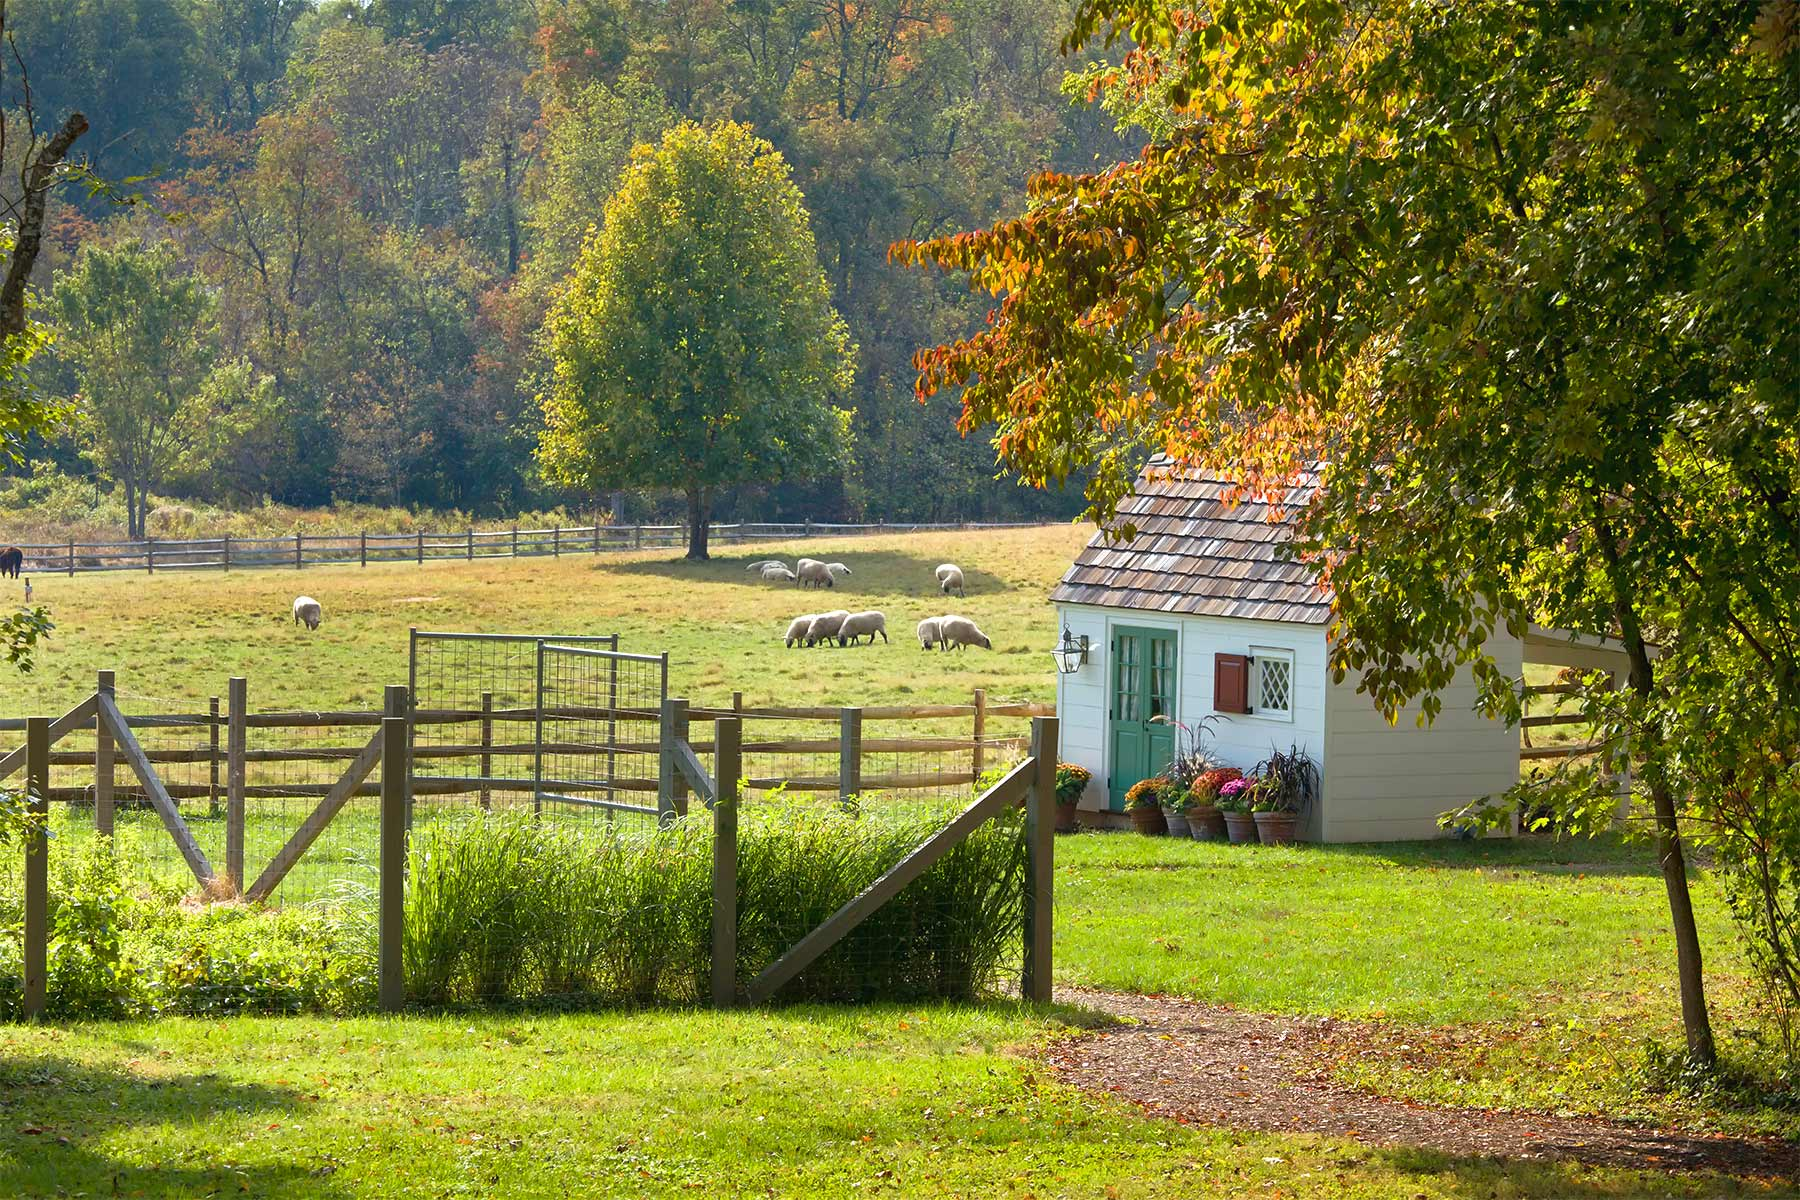 The farm at the Inn at Little Washington.